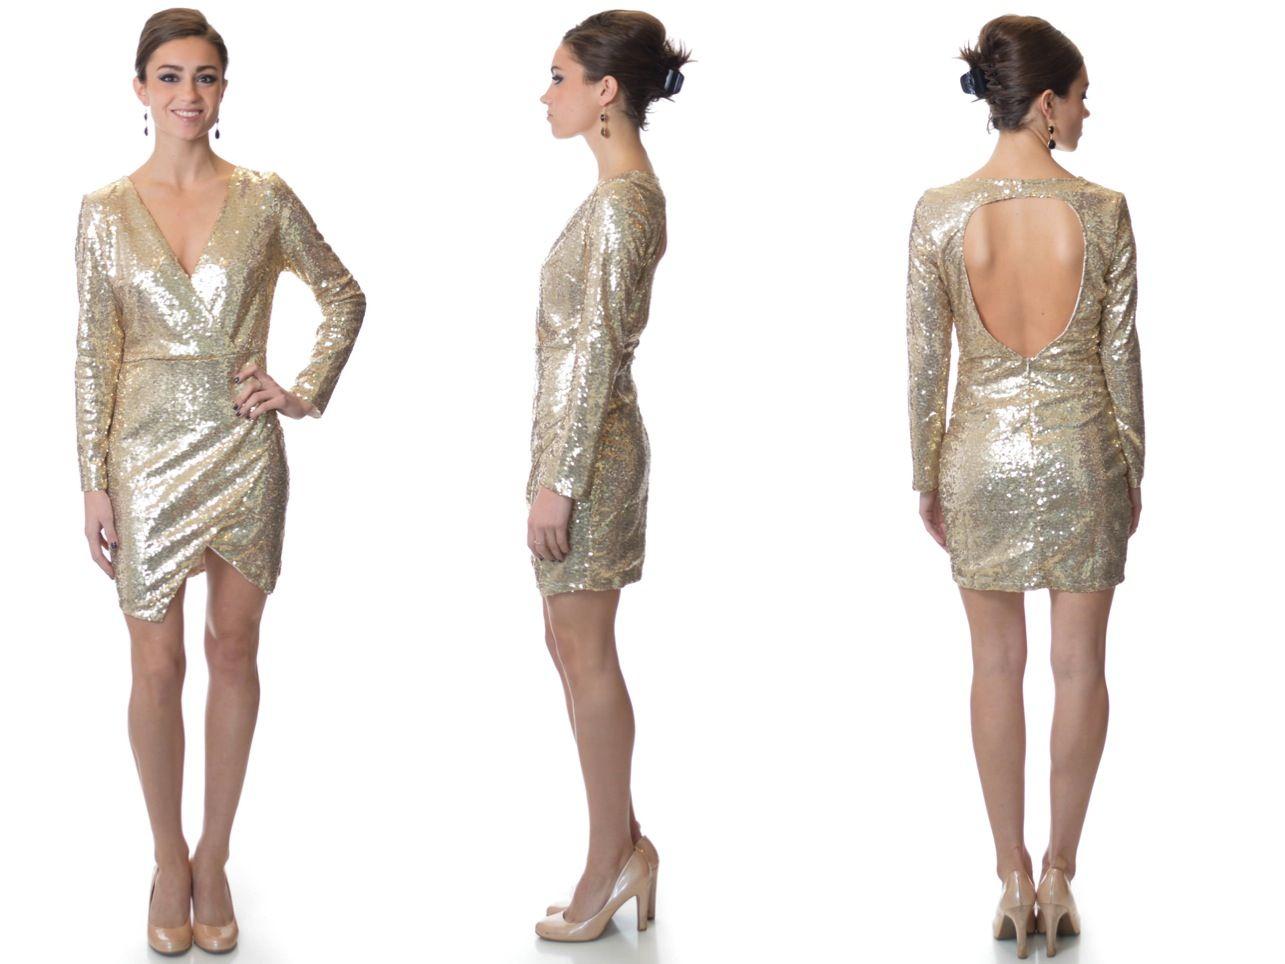 Studio 54 Gold Sequin Dress #golddress #nyedress #sequindress ...